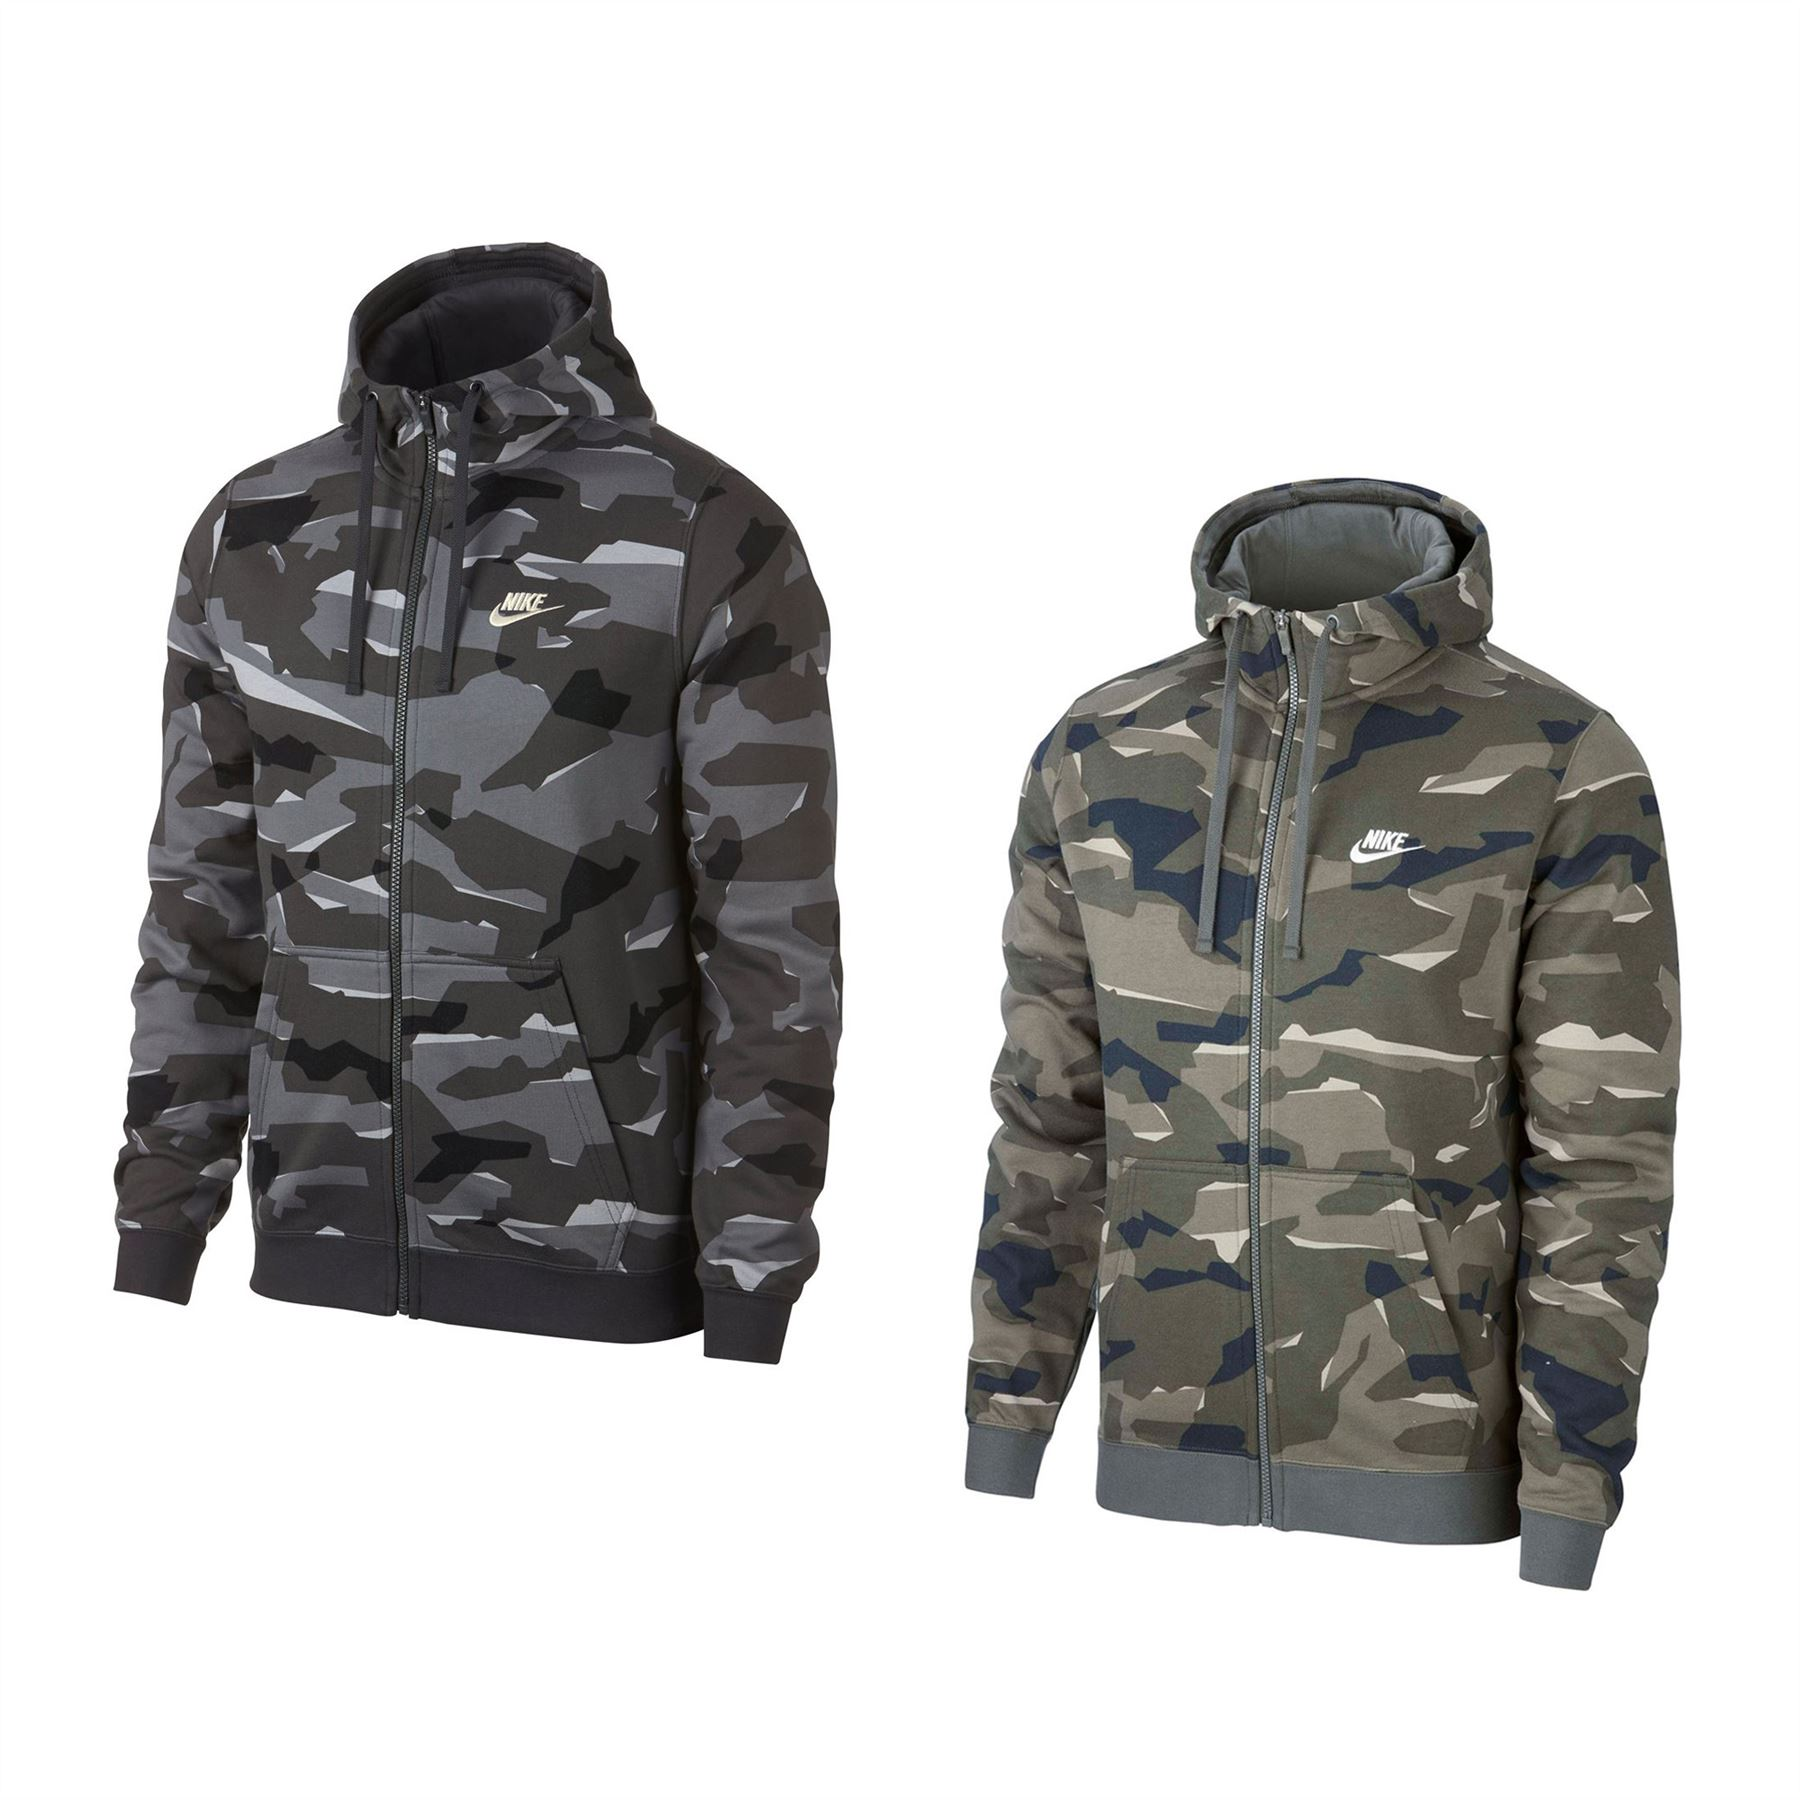 cebe66e49e9f ... Nike Camouflage Full Zip Hoody veste Mens Hoodie sweat-shirt chandail à  capuchon Top ...